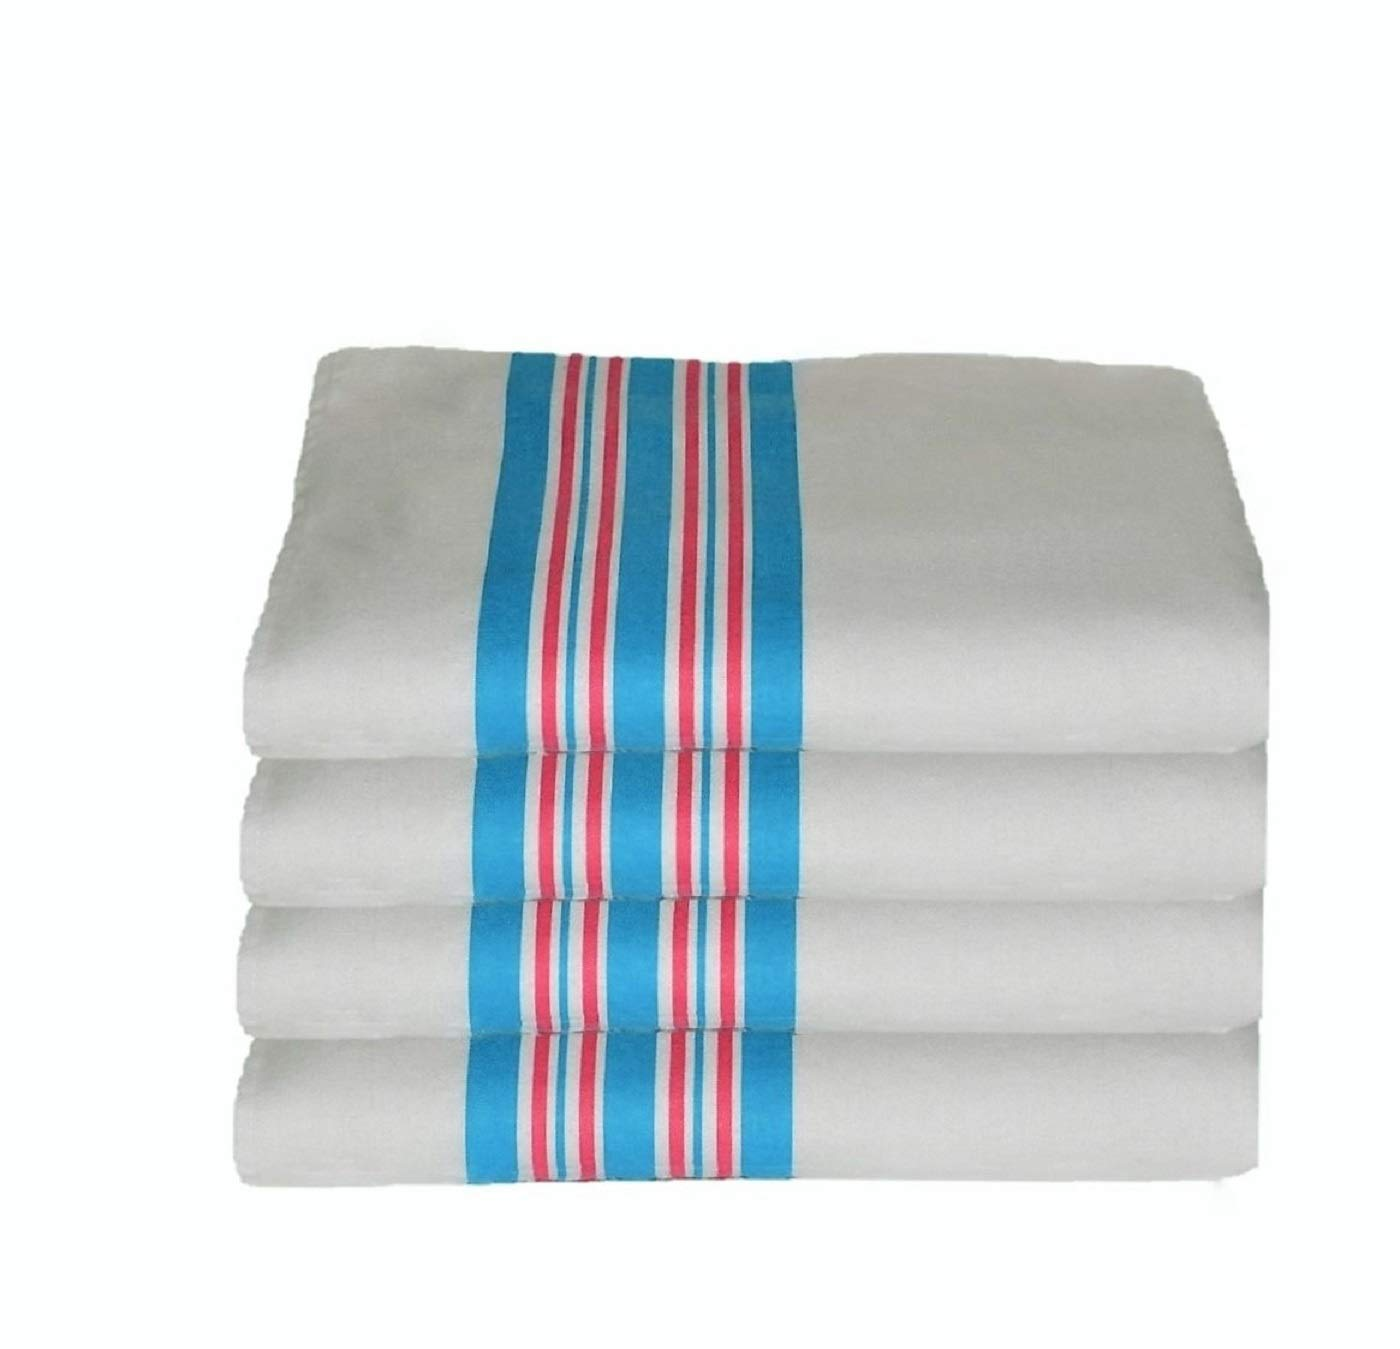 Amazon Com Linteum Textile 12 Pack 36x36 In Receiving